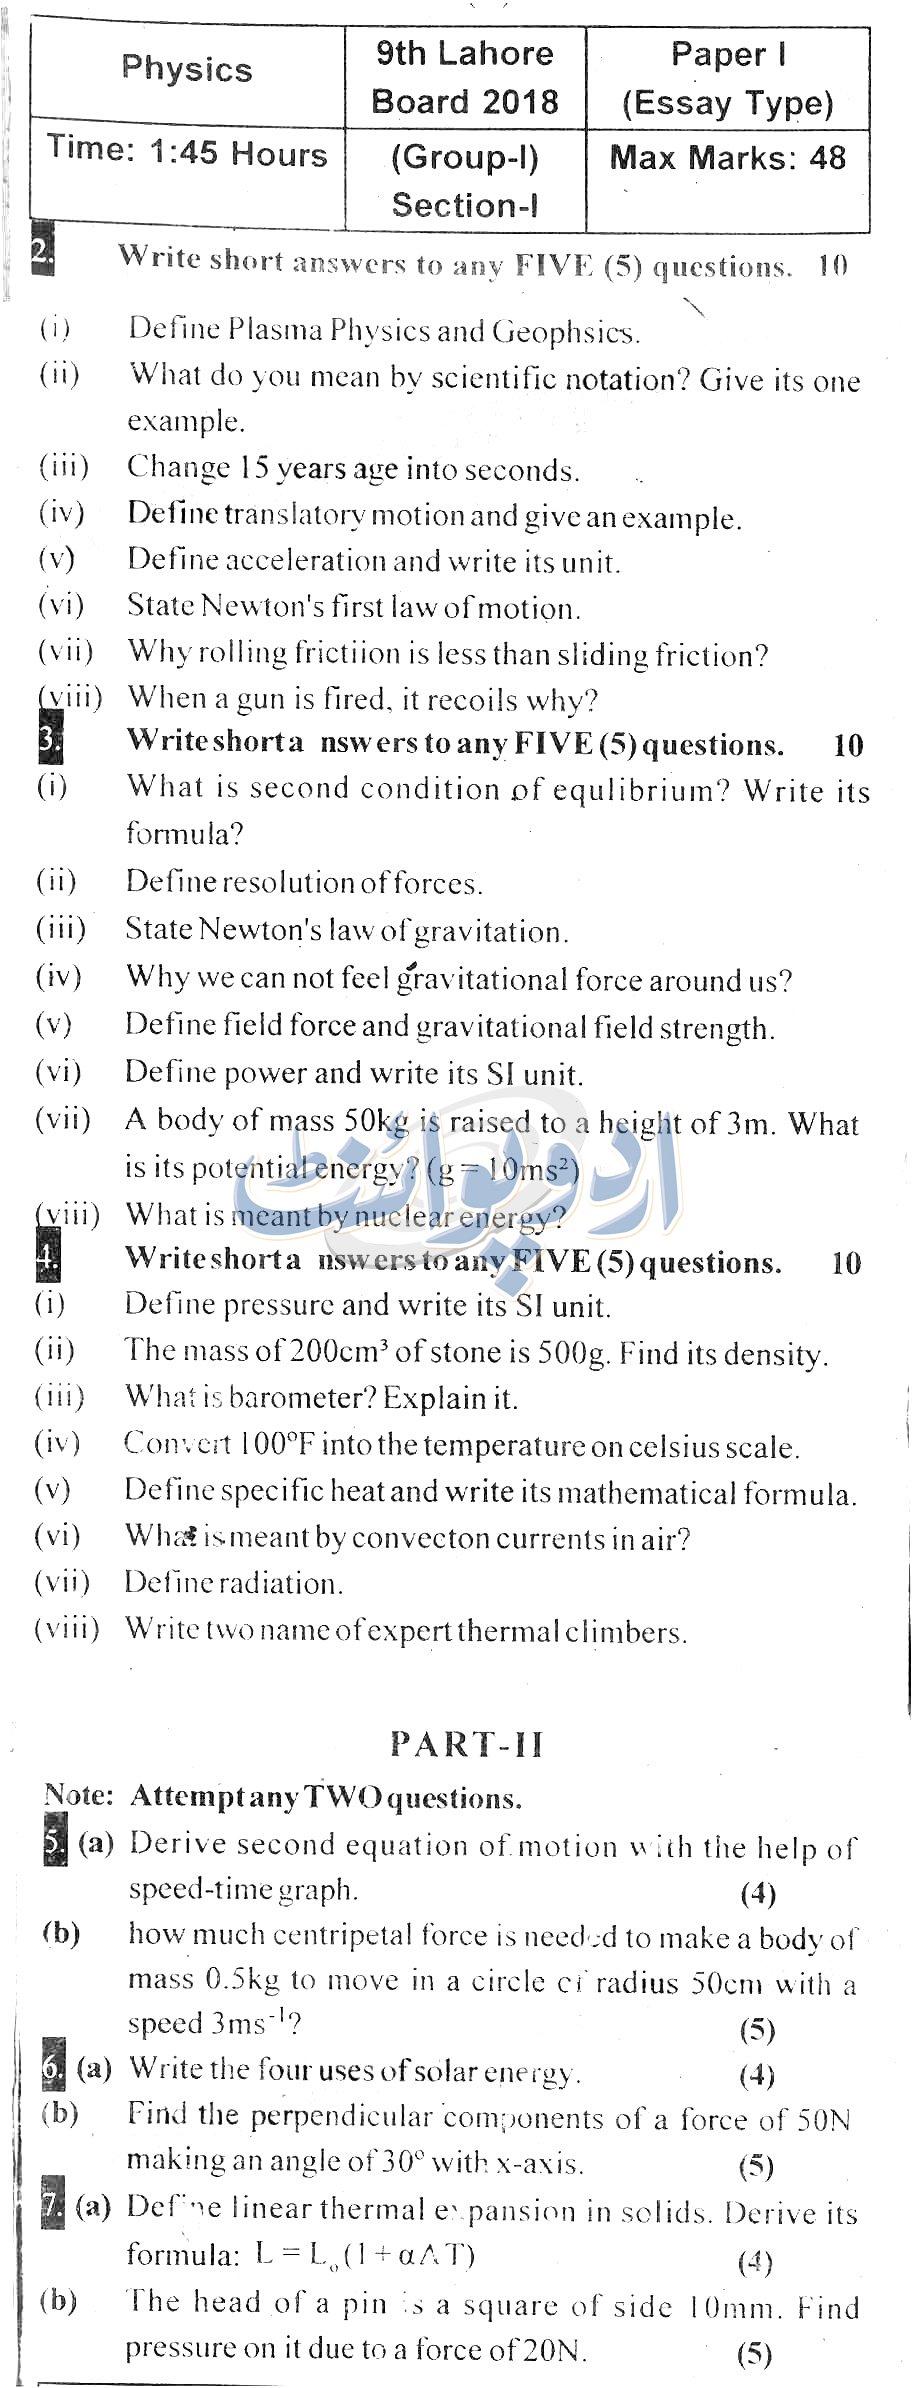 BISE Lahore Physics, Subjective Part Paper Annual Part-I